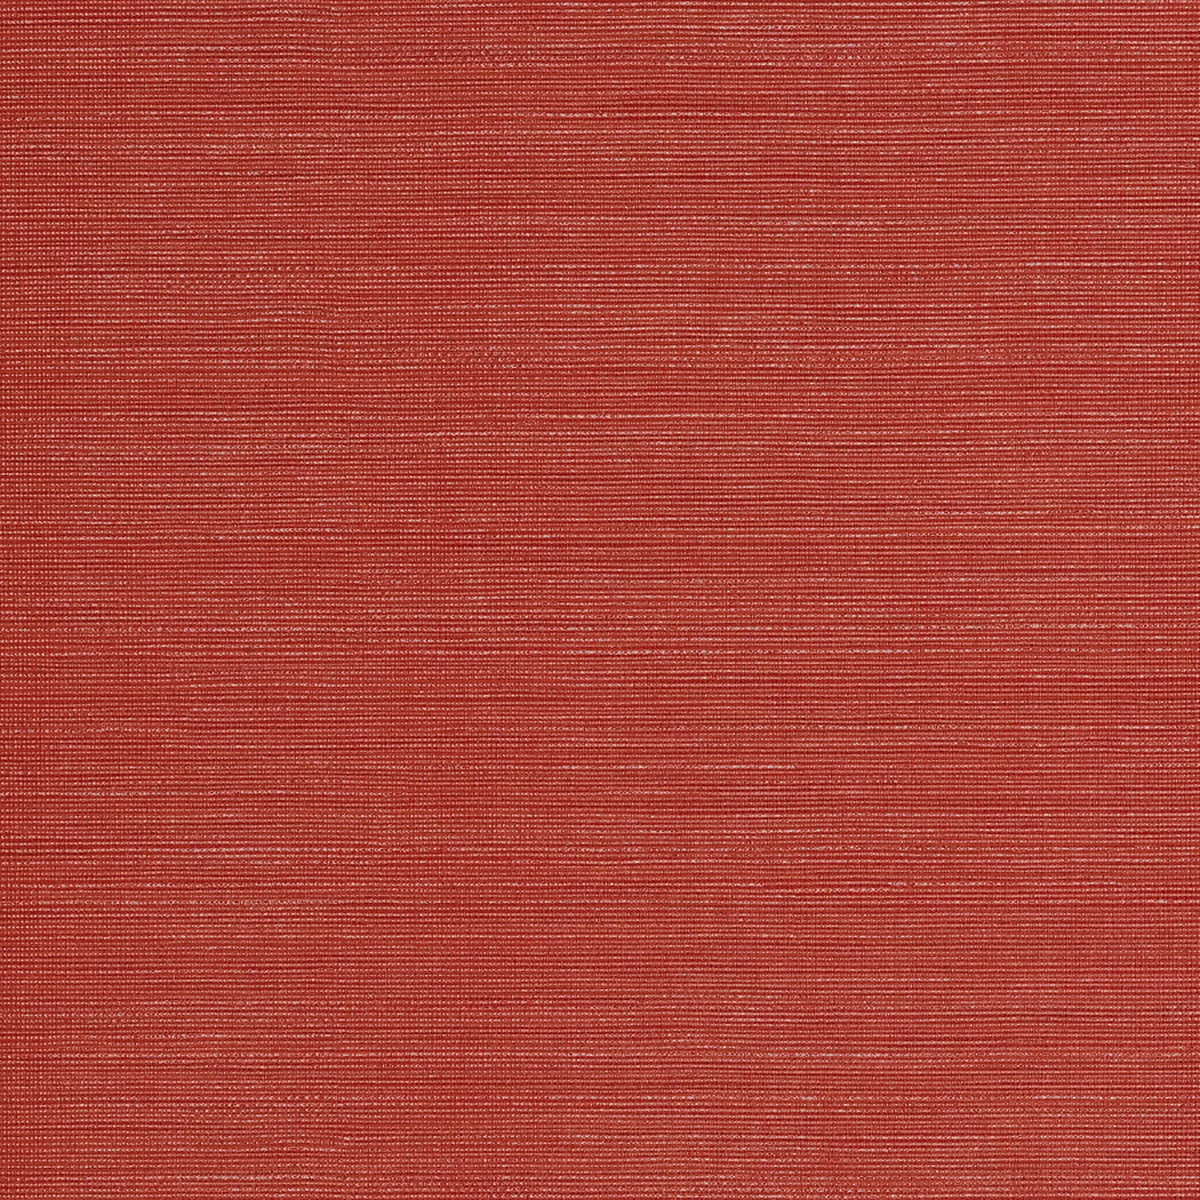 RED/ORANGE